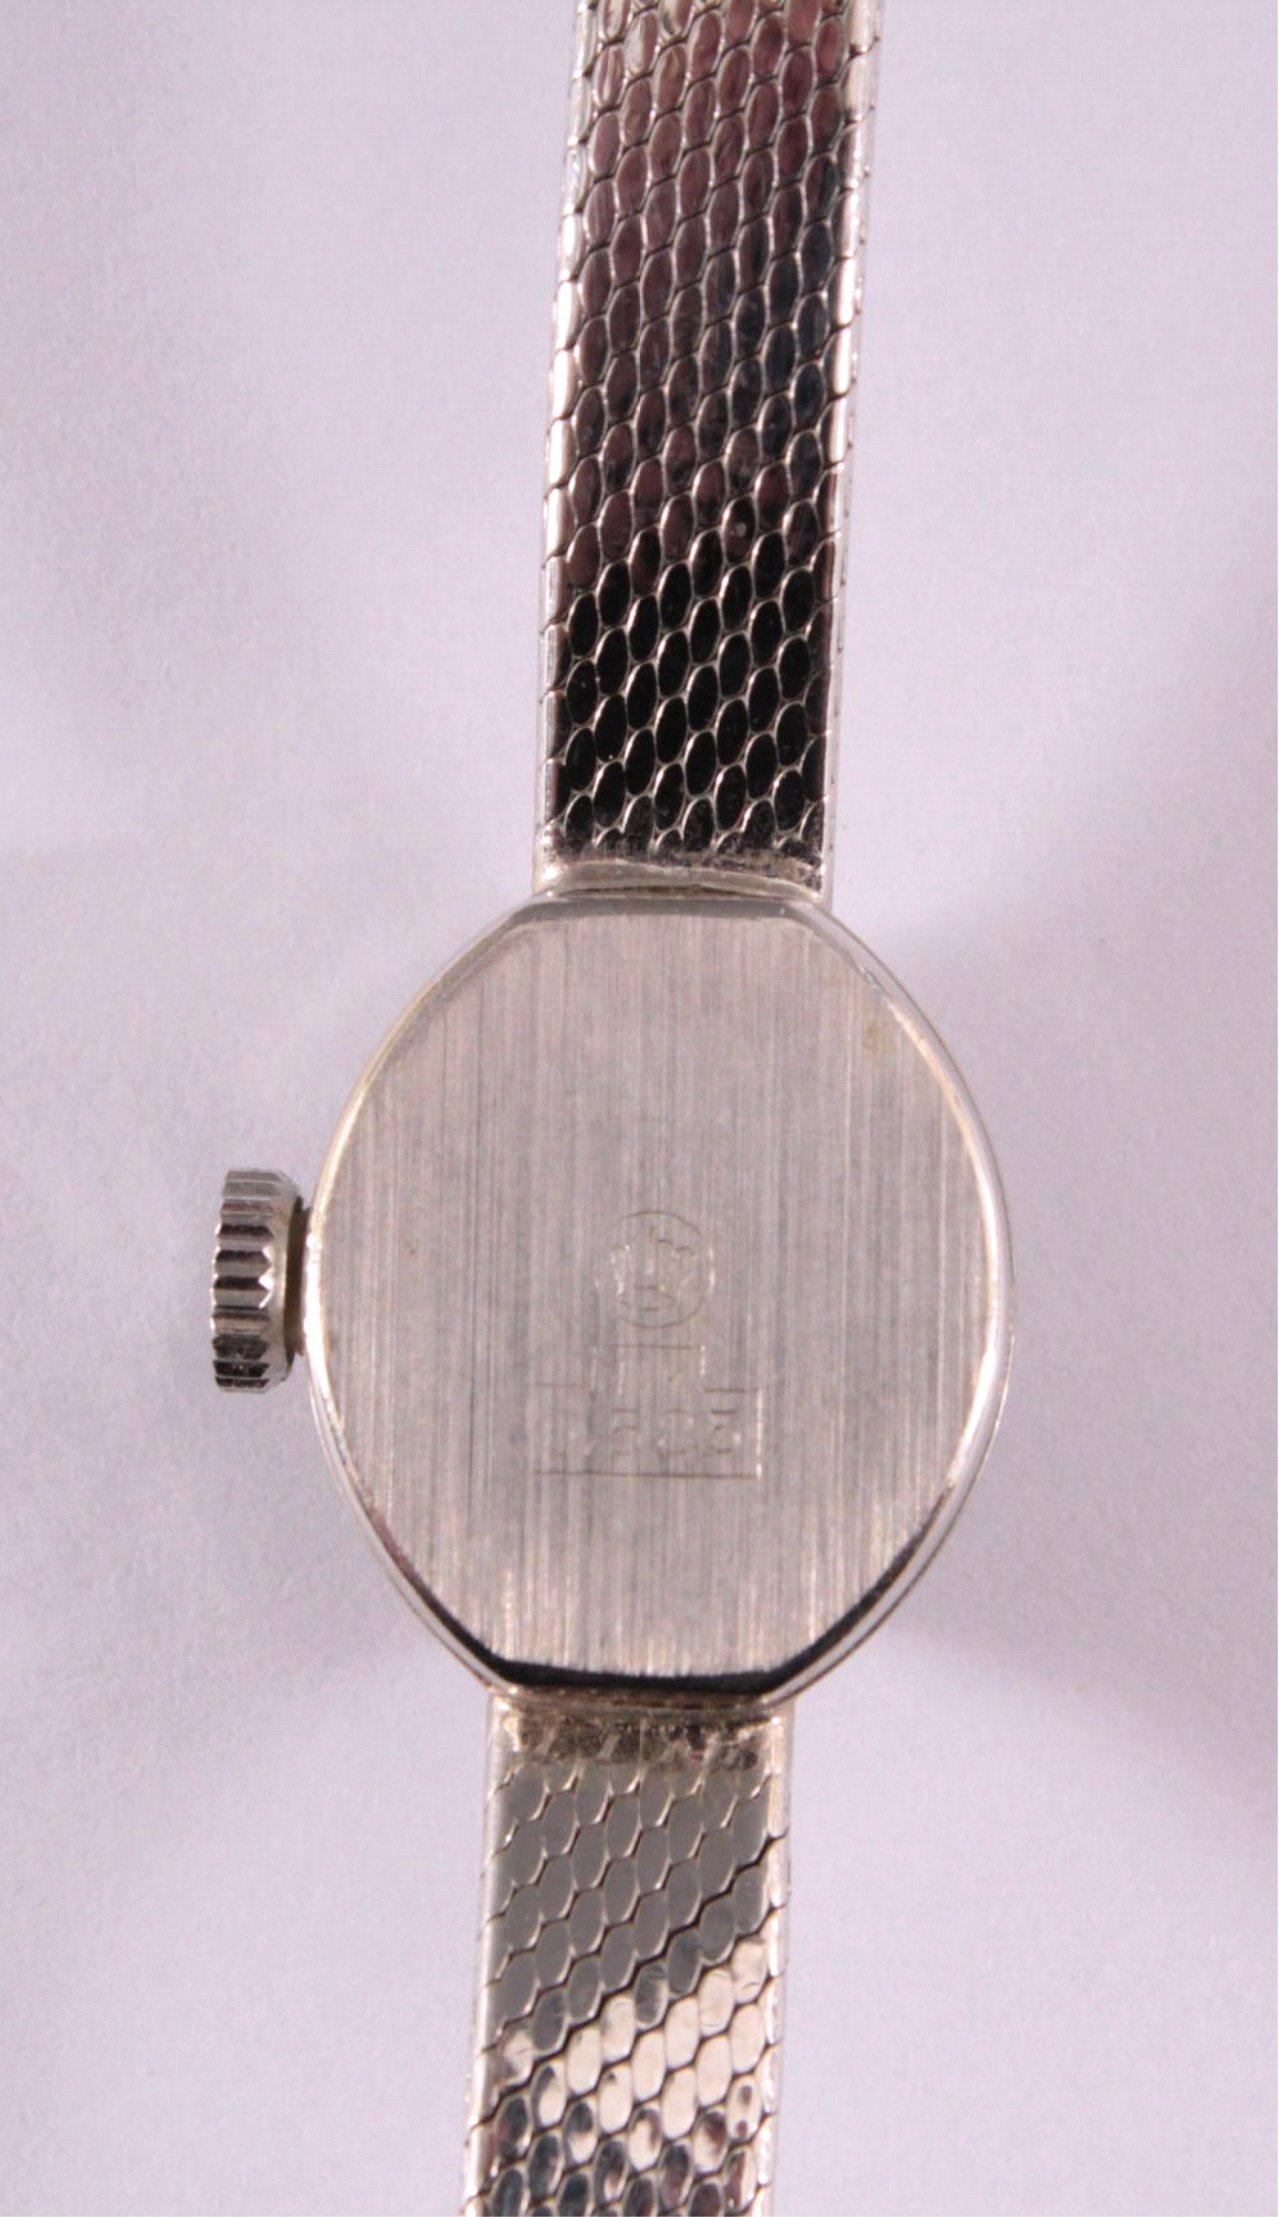 Roxy Anker Damenarmbanduhr, 14 Karat Weißgold-3